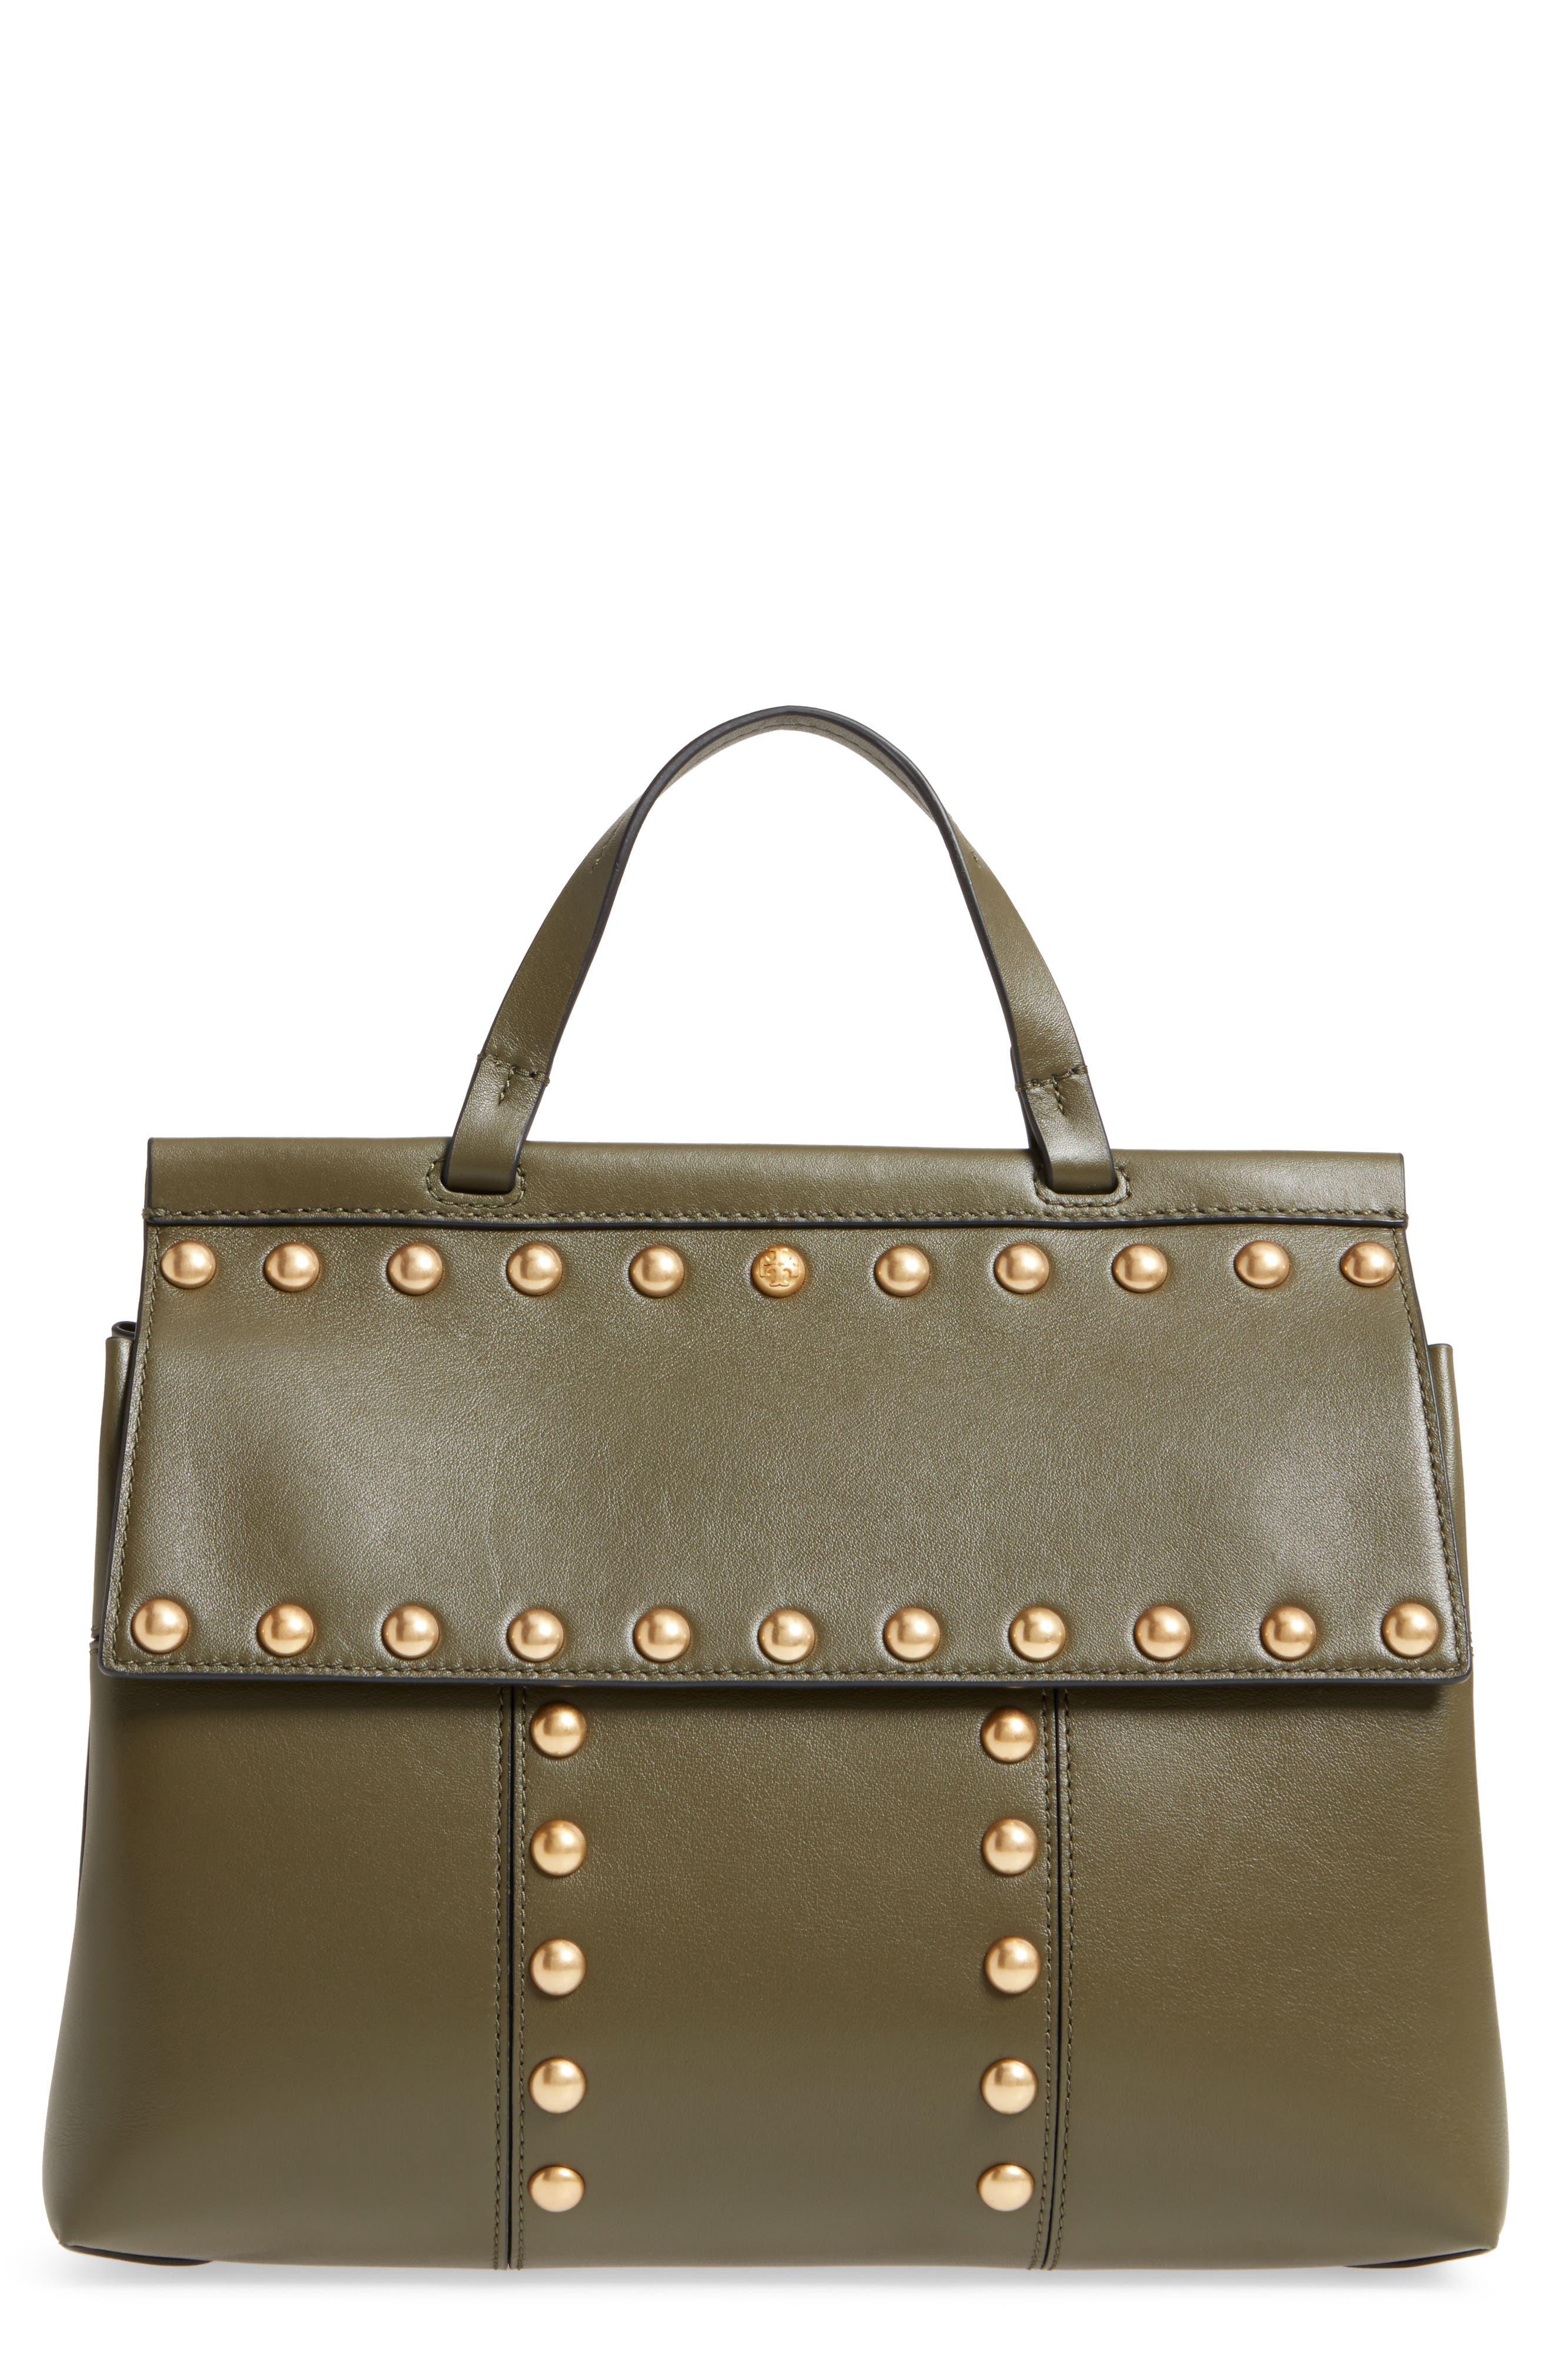 Block-T Studded Leather Top Handle Satchel,                             Main thumbnail 1, color,                             300